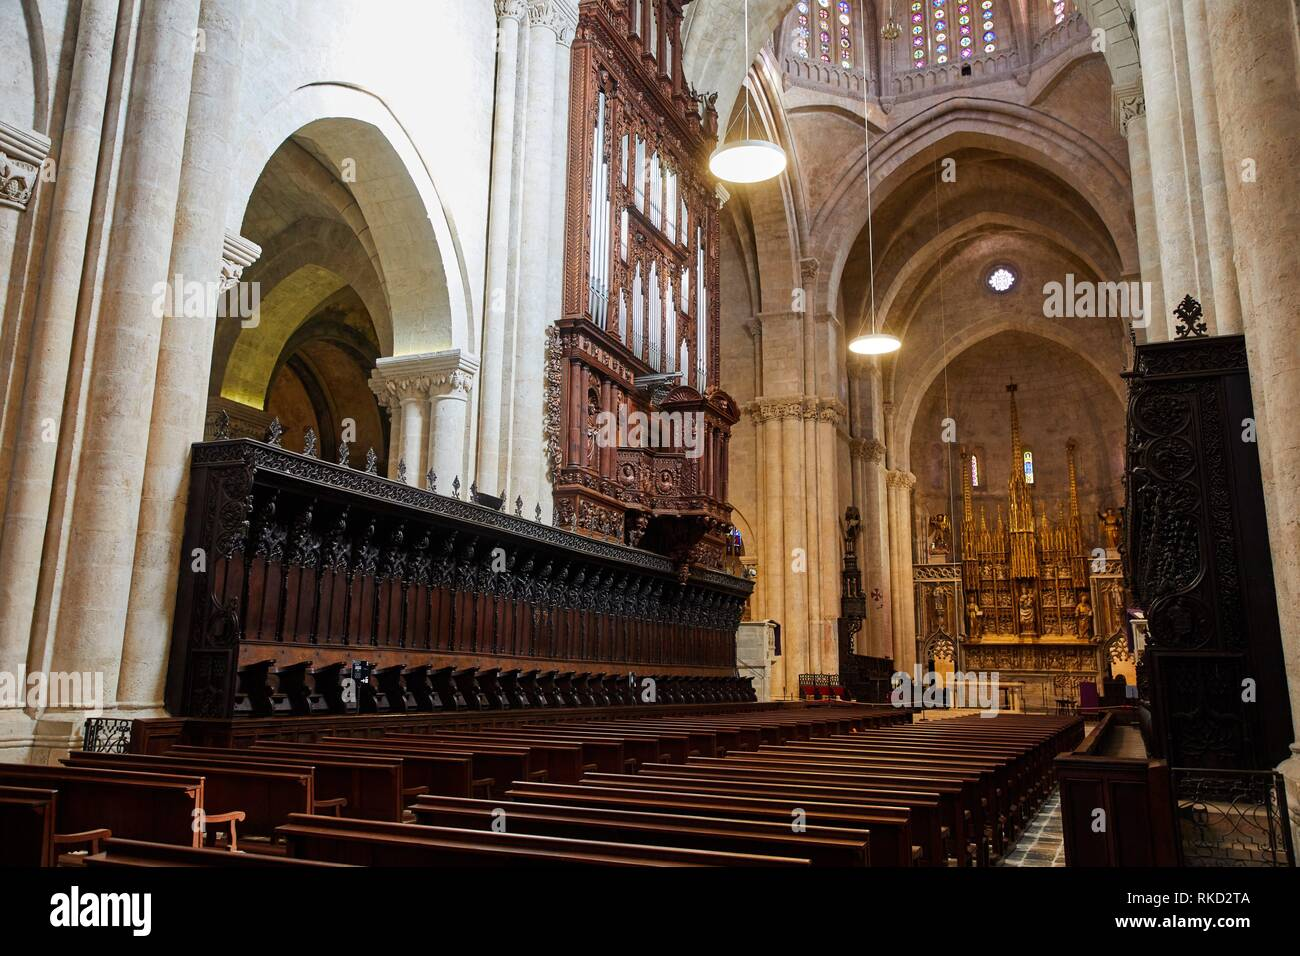 Orgel, Chorgestühl, Kathedrale, Stadt Tarragona, Katalonien, Spanien, Europa Stockbild